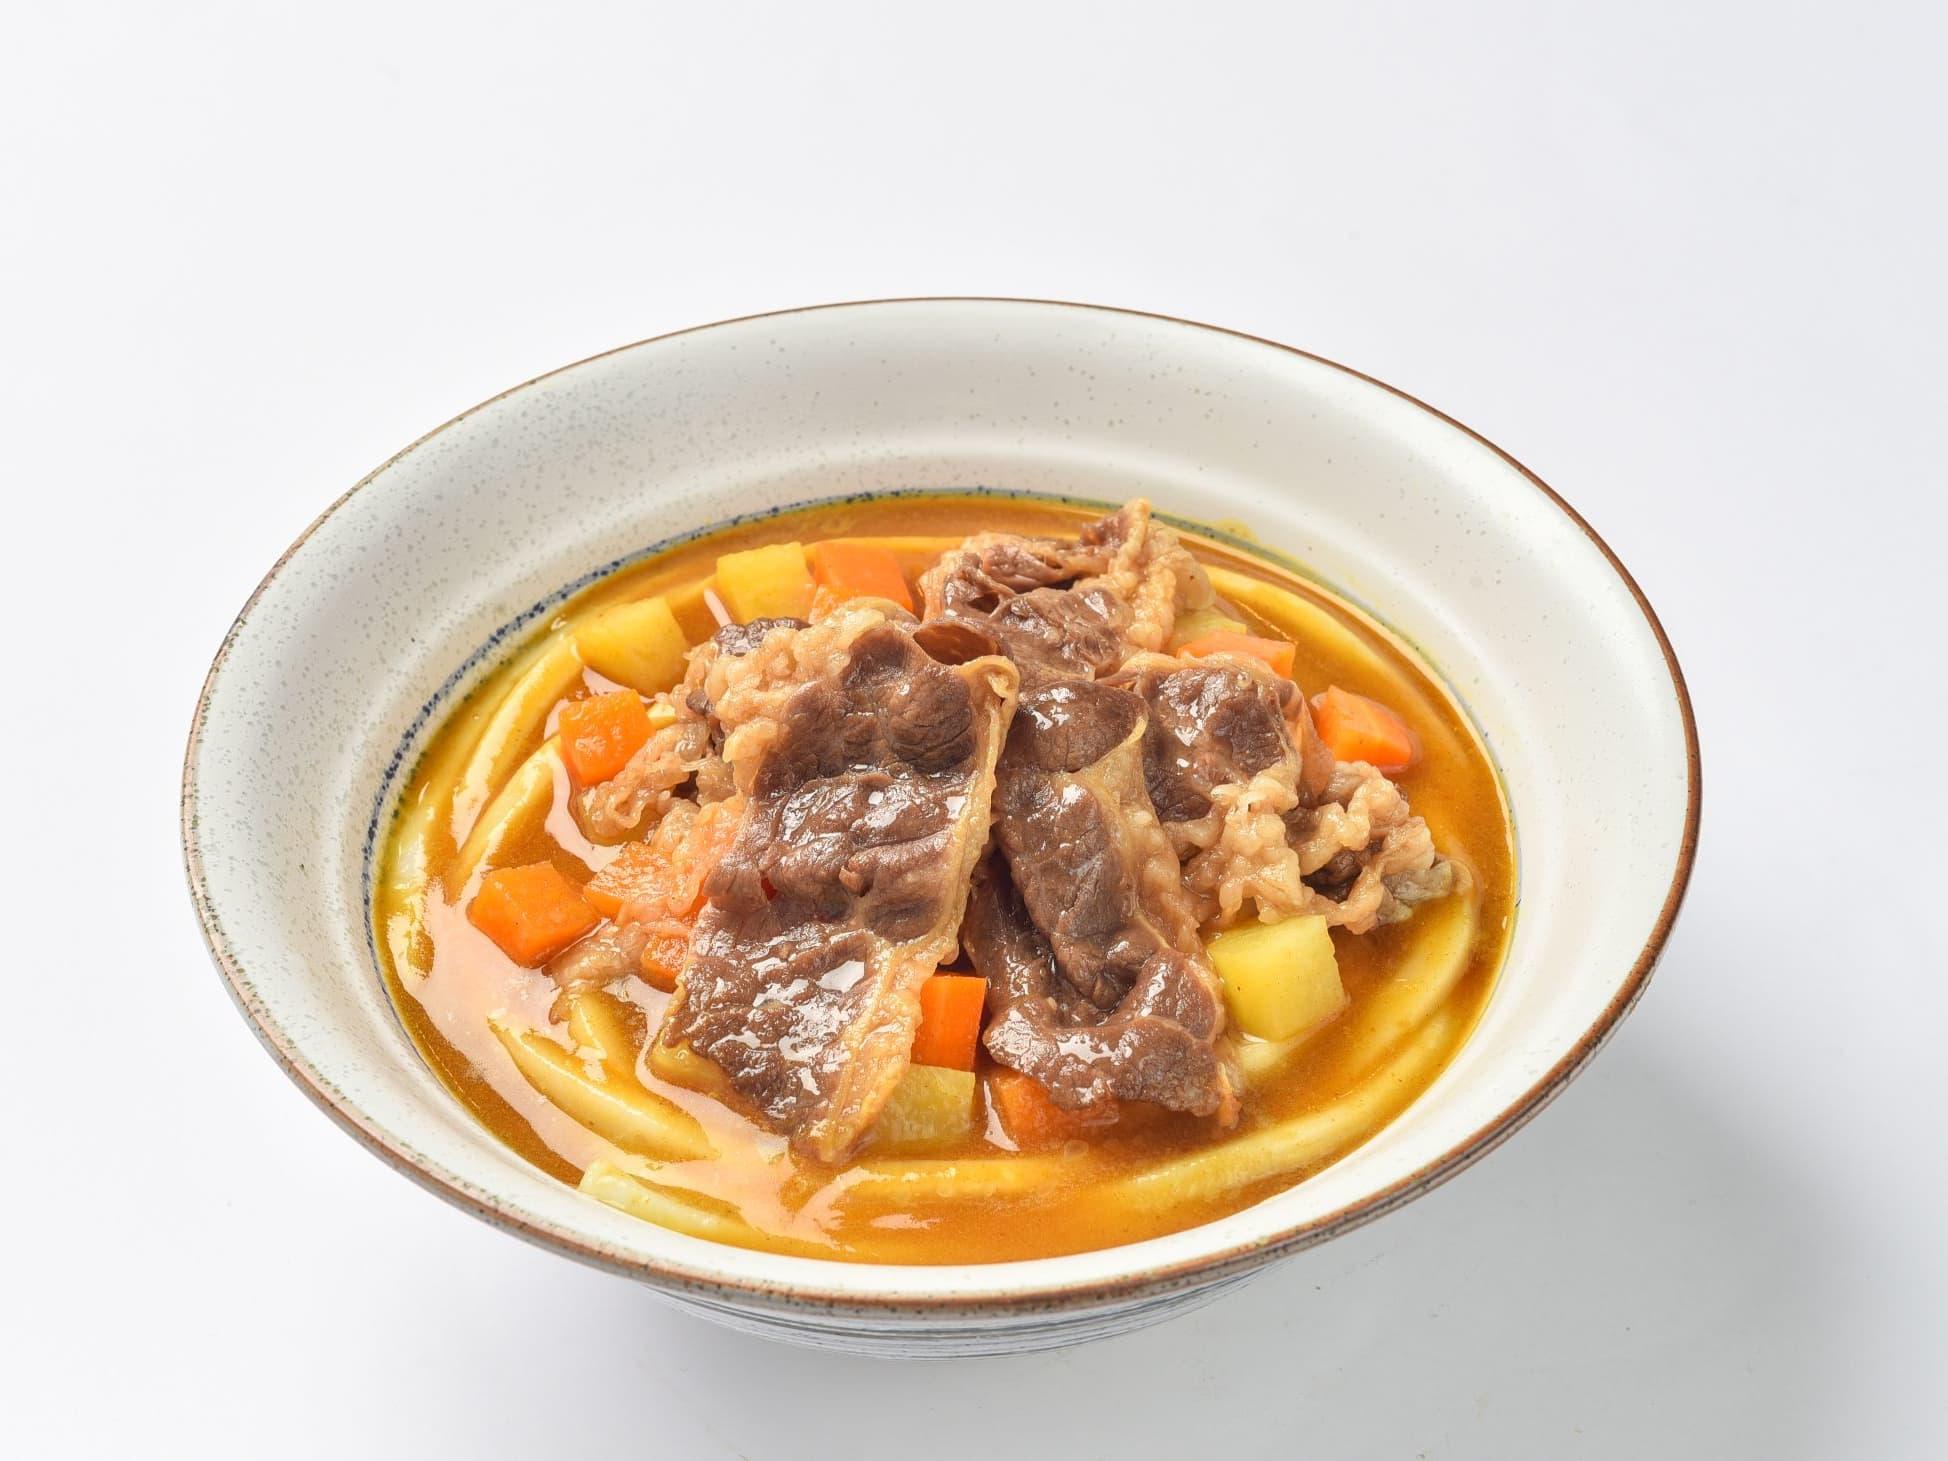 1 x Beef Curry Udon or Donburi + Ebi Tempura + Barley Drink